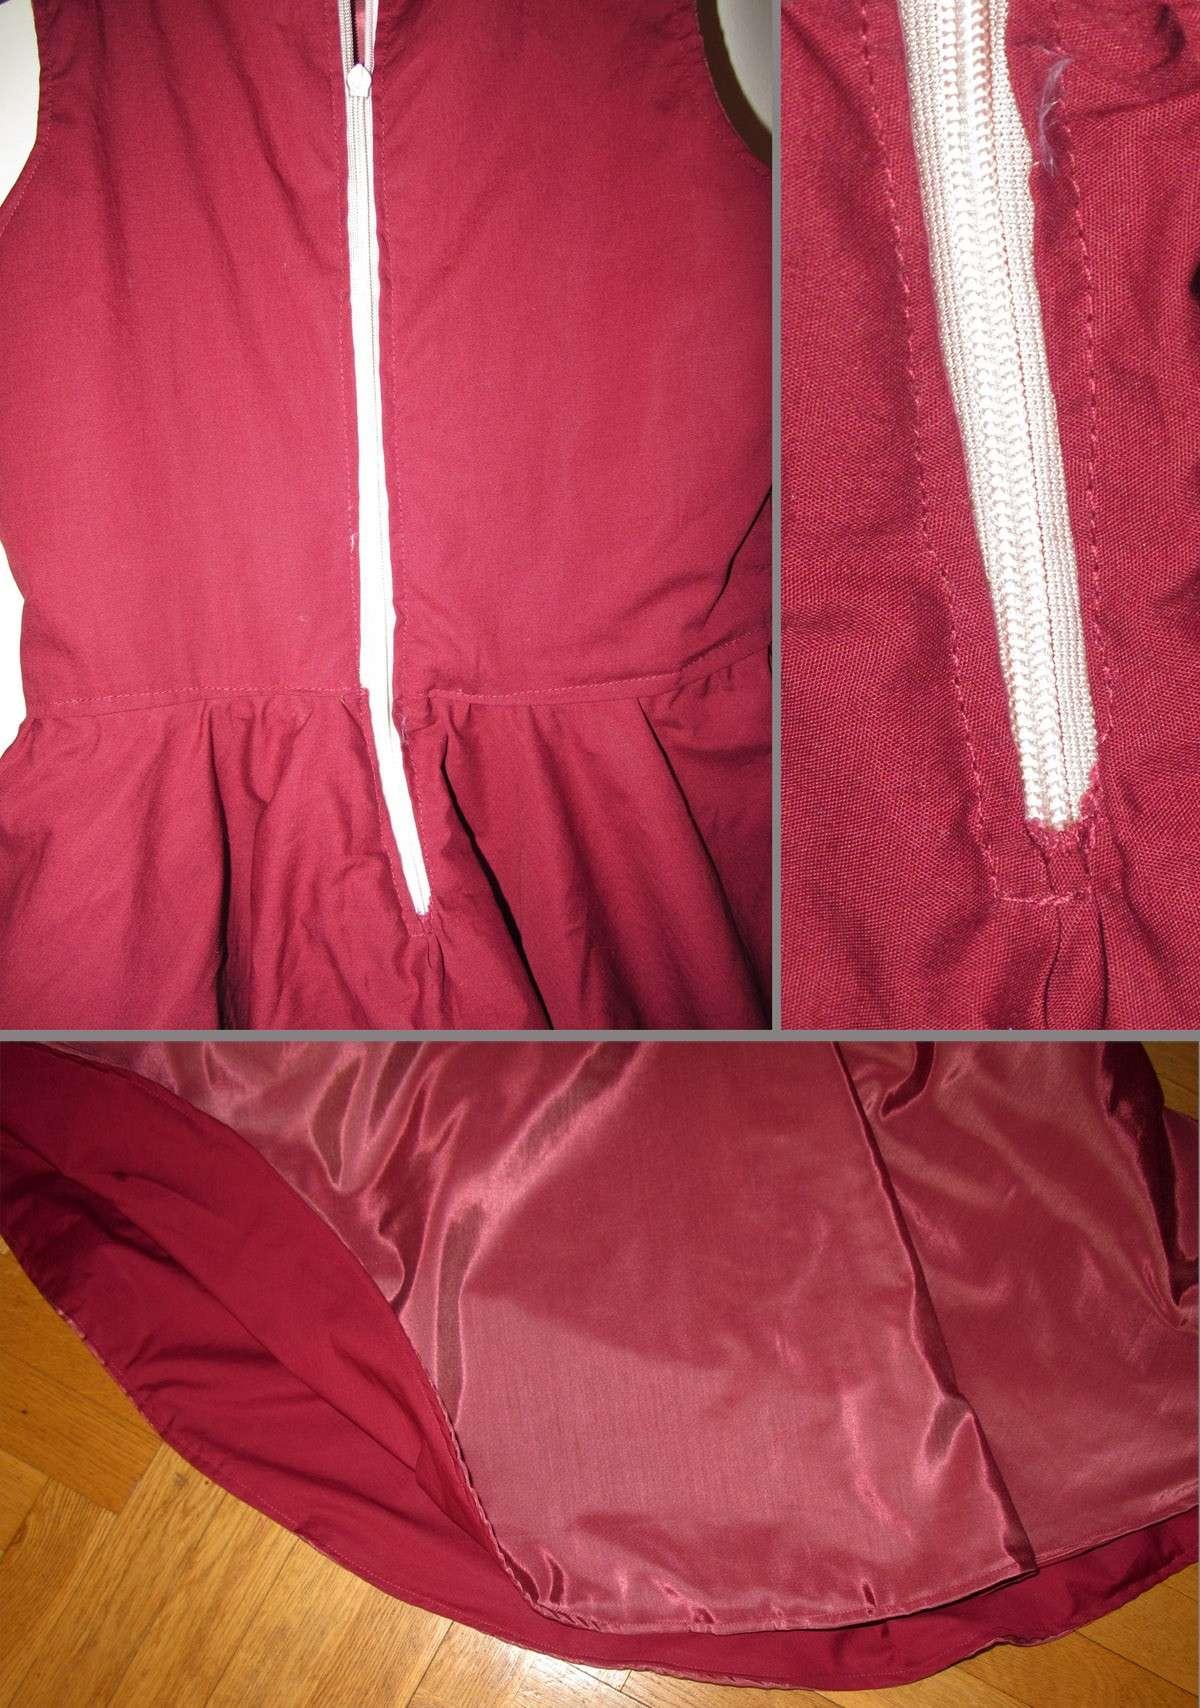 http://i41.servimg.com/u/f41/09/01/63/29/robe-t44.jpg